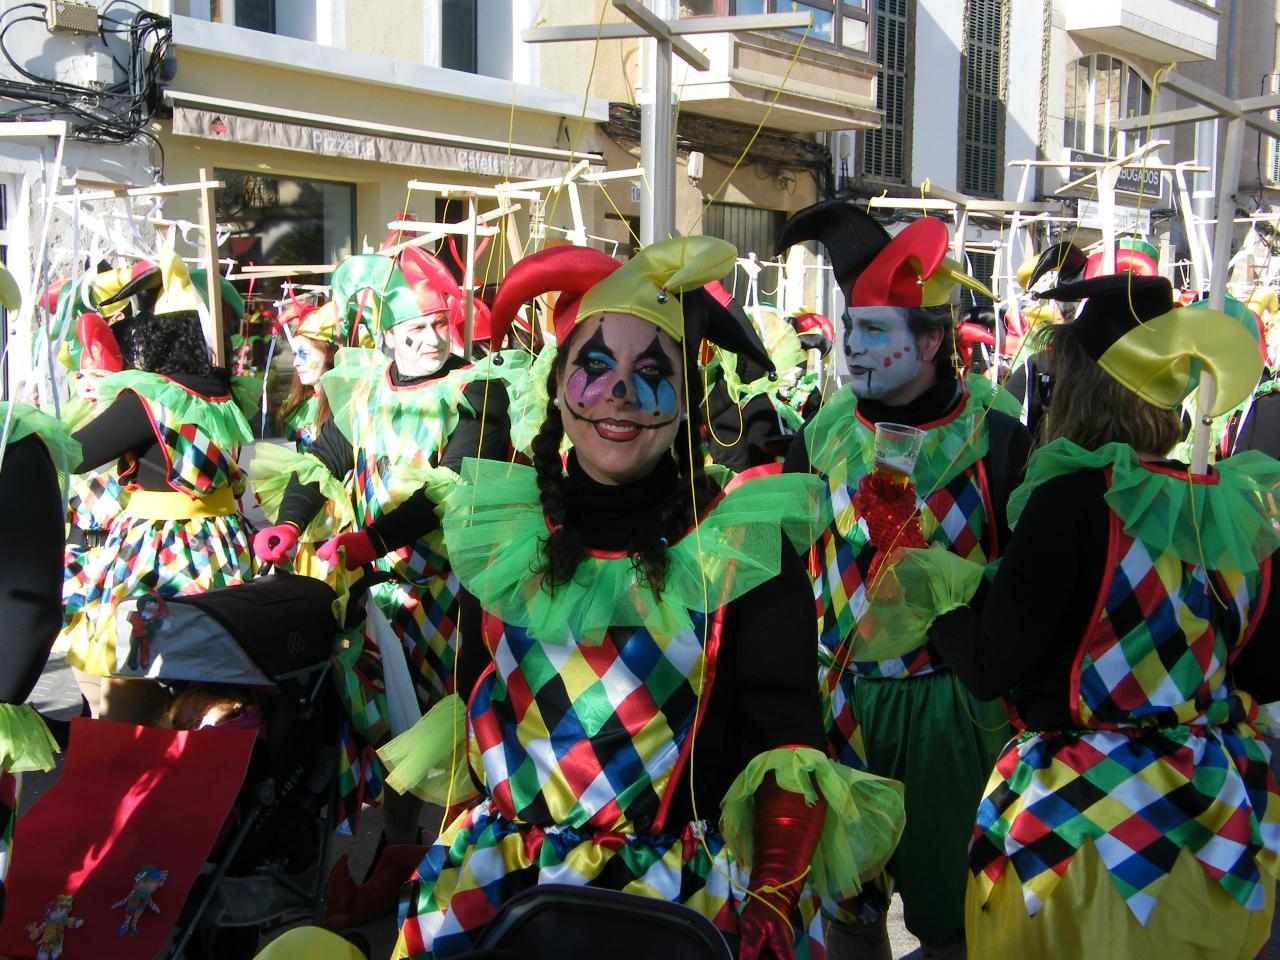 Angélica Pastor, de marioneta en la Rua de Felanitx: no se engañen, no es títere de nadie